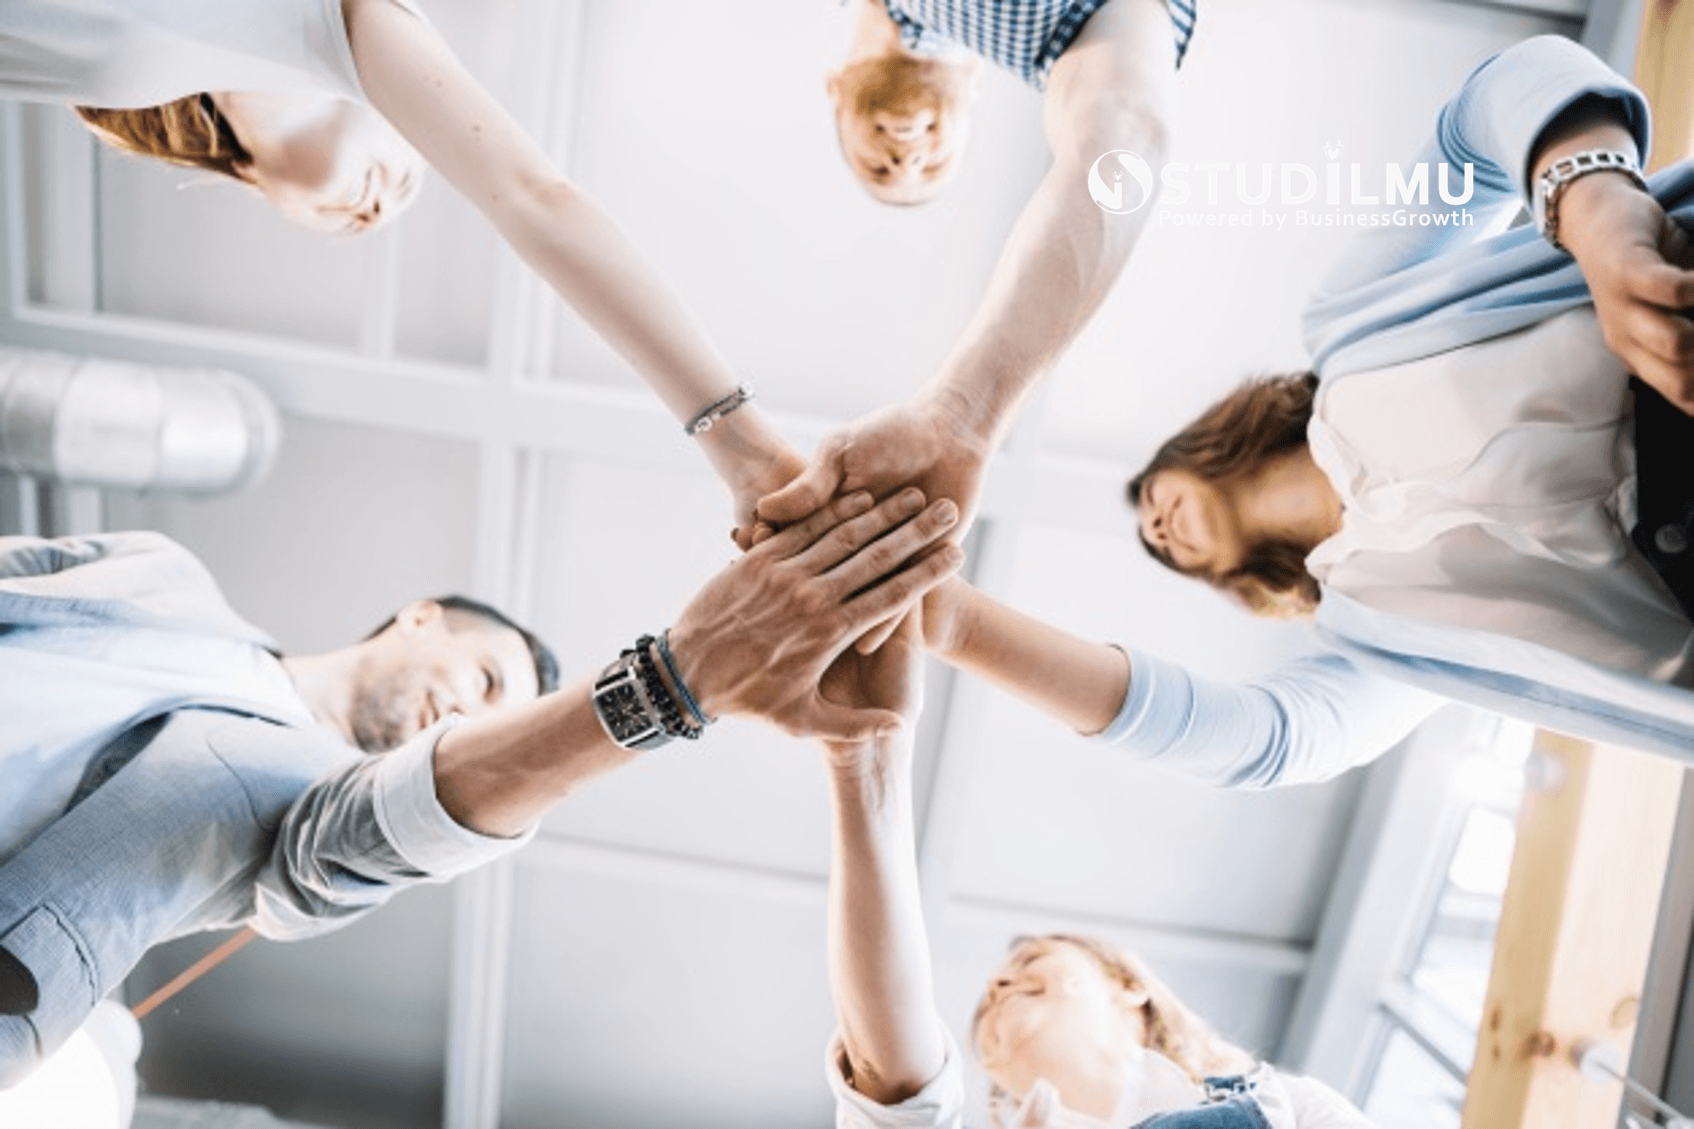 STUDILMU Career Advice - 6 Cara Hebat Mendorong Kerja Sama Tim